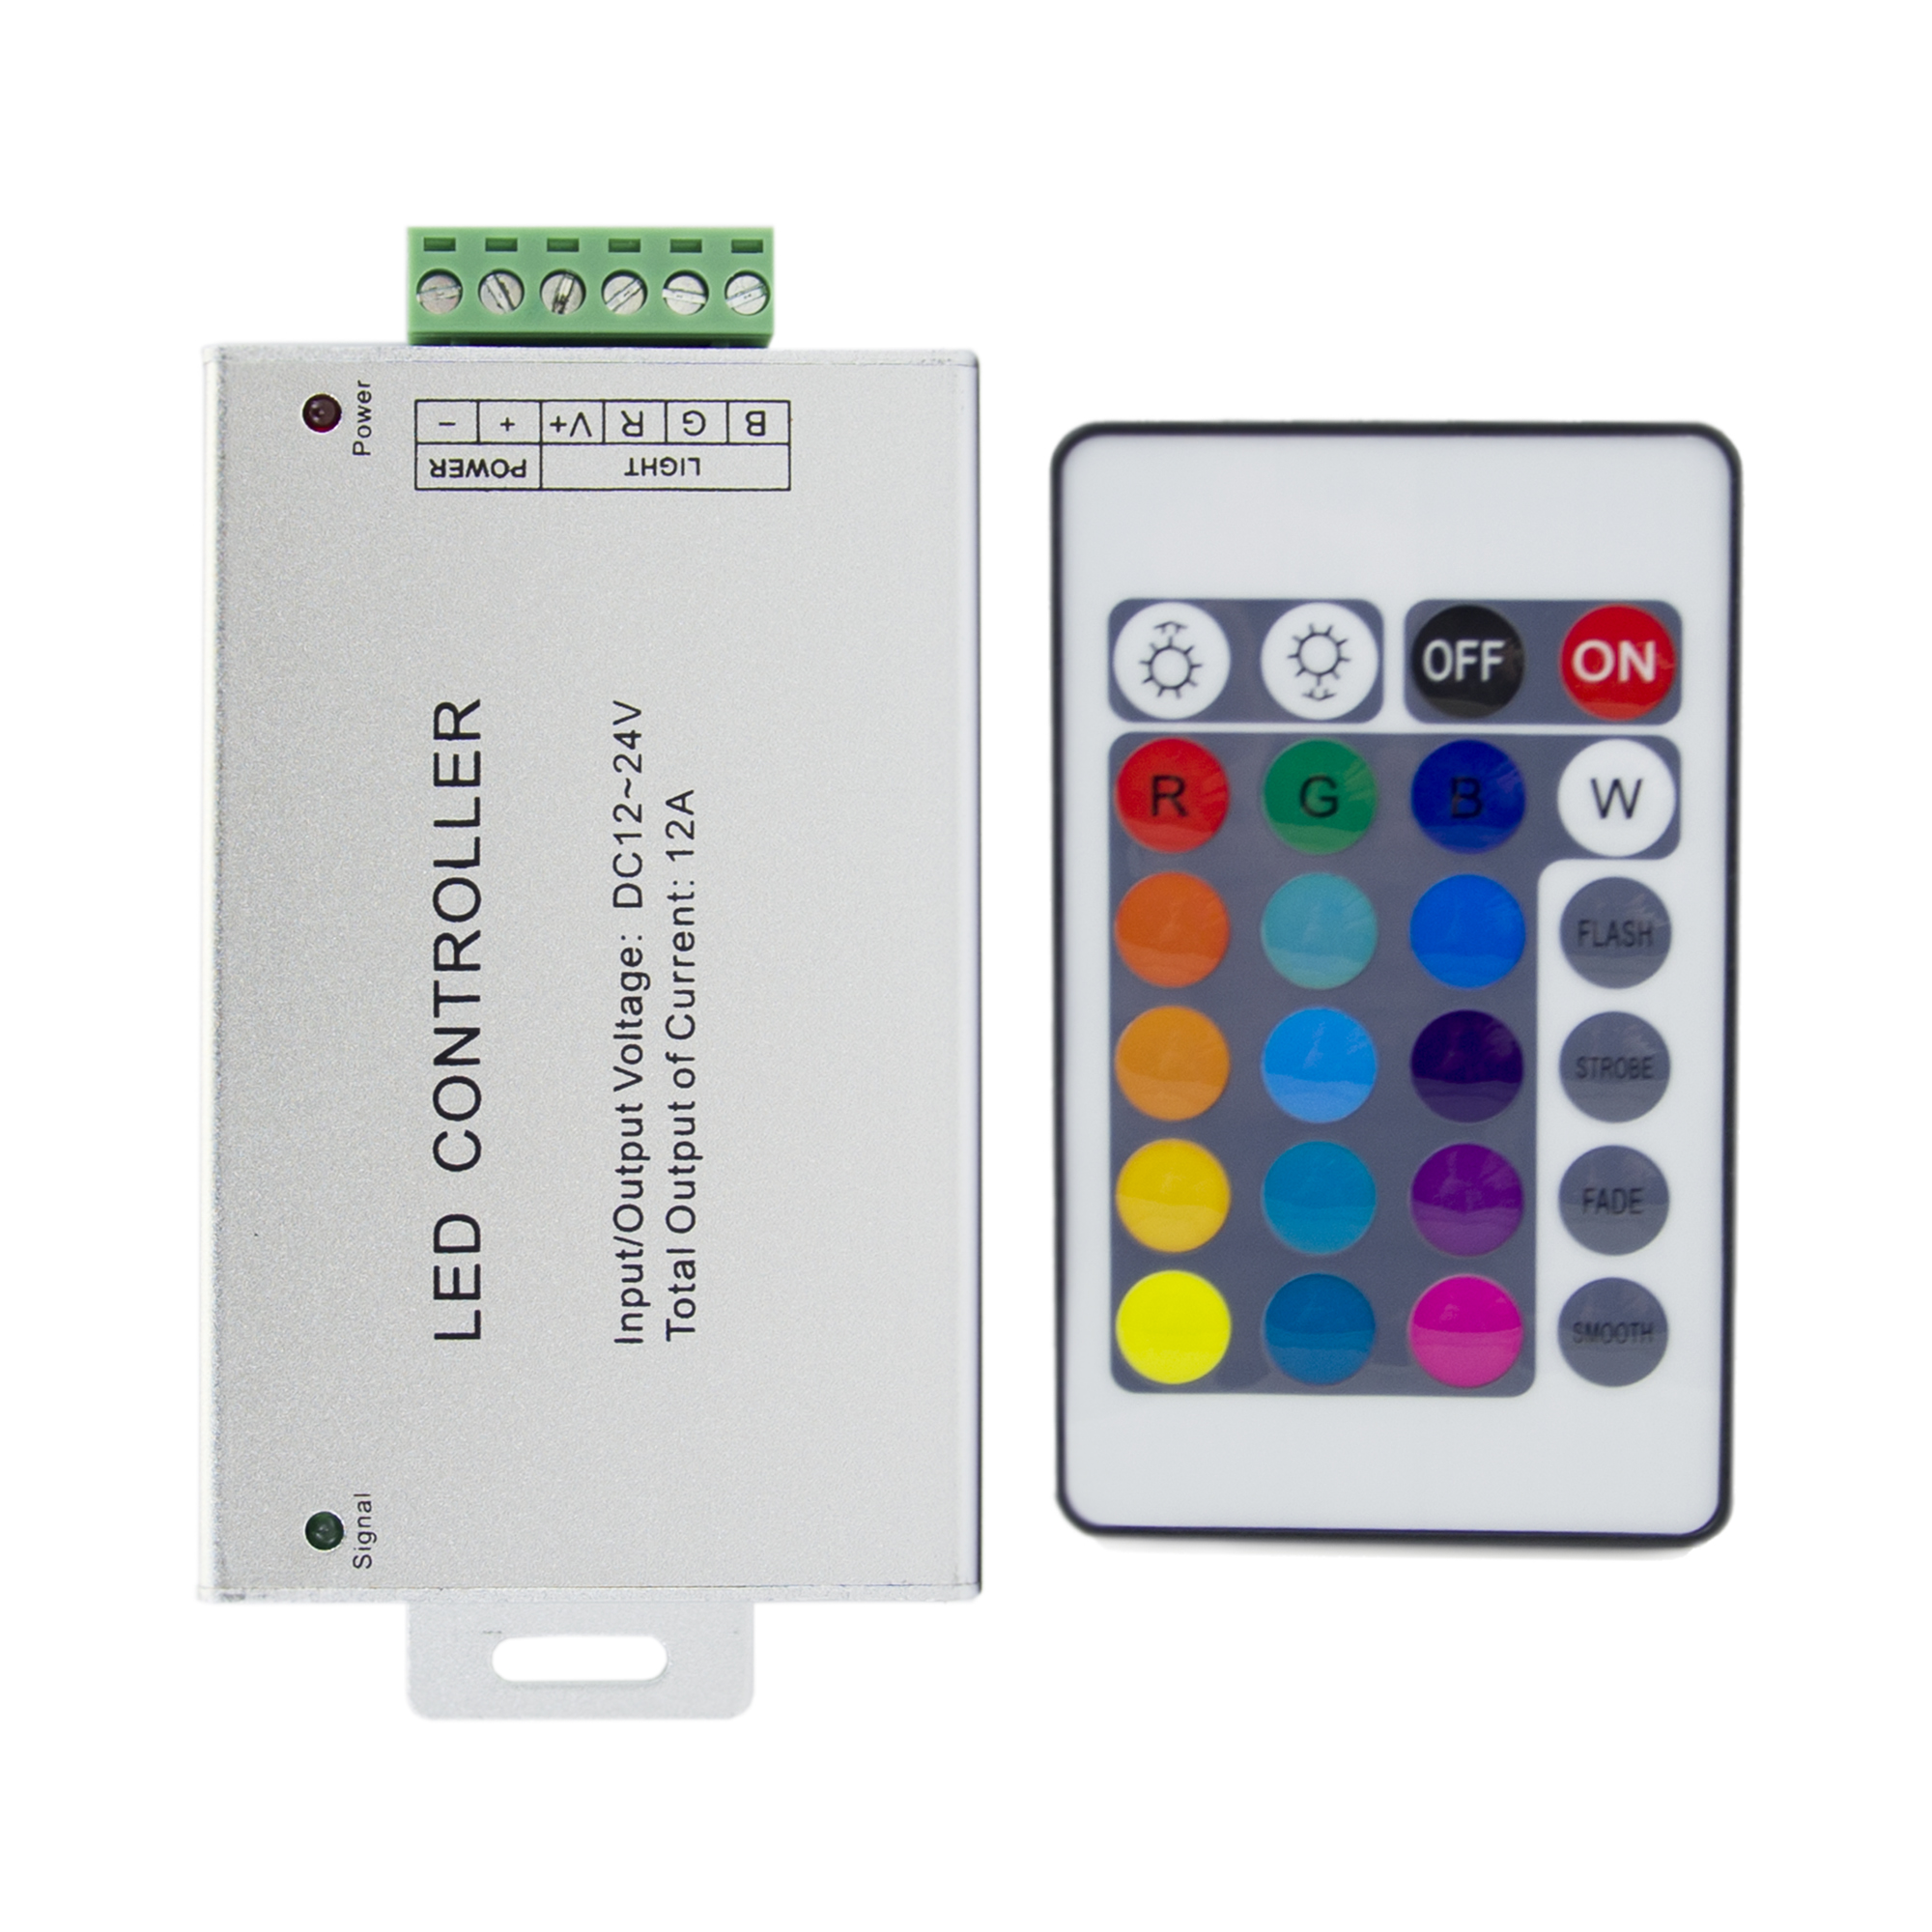 Контроллер Apeyron 02isp000153